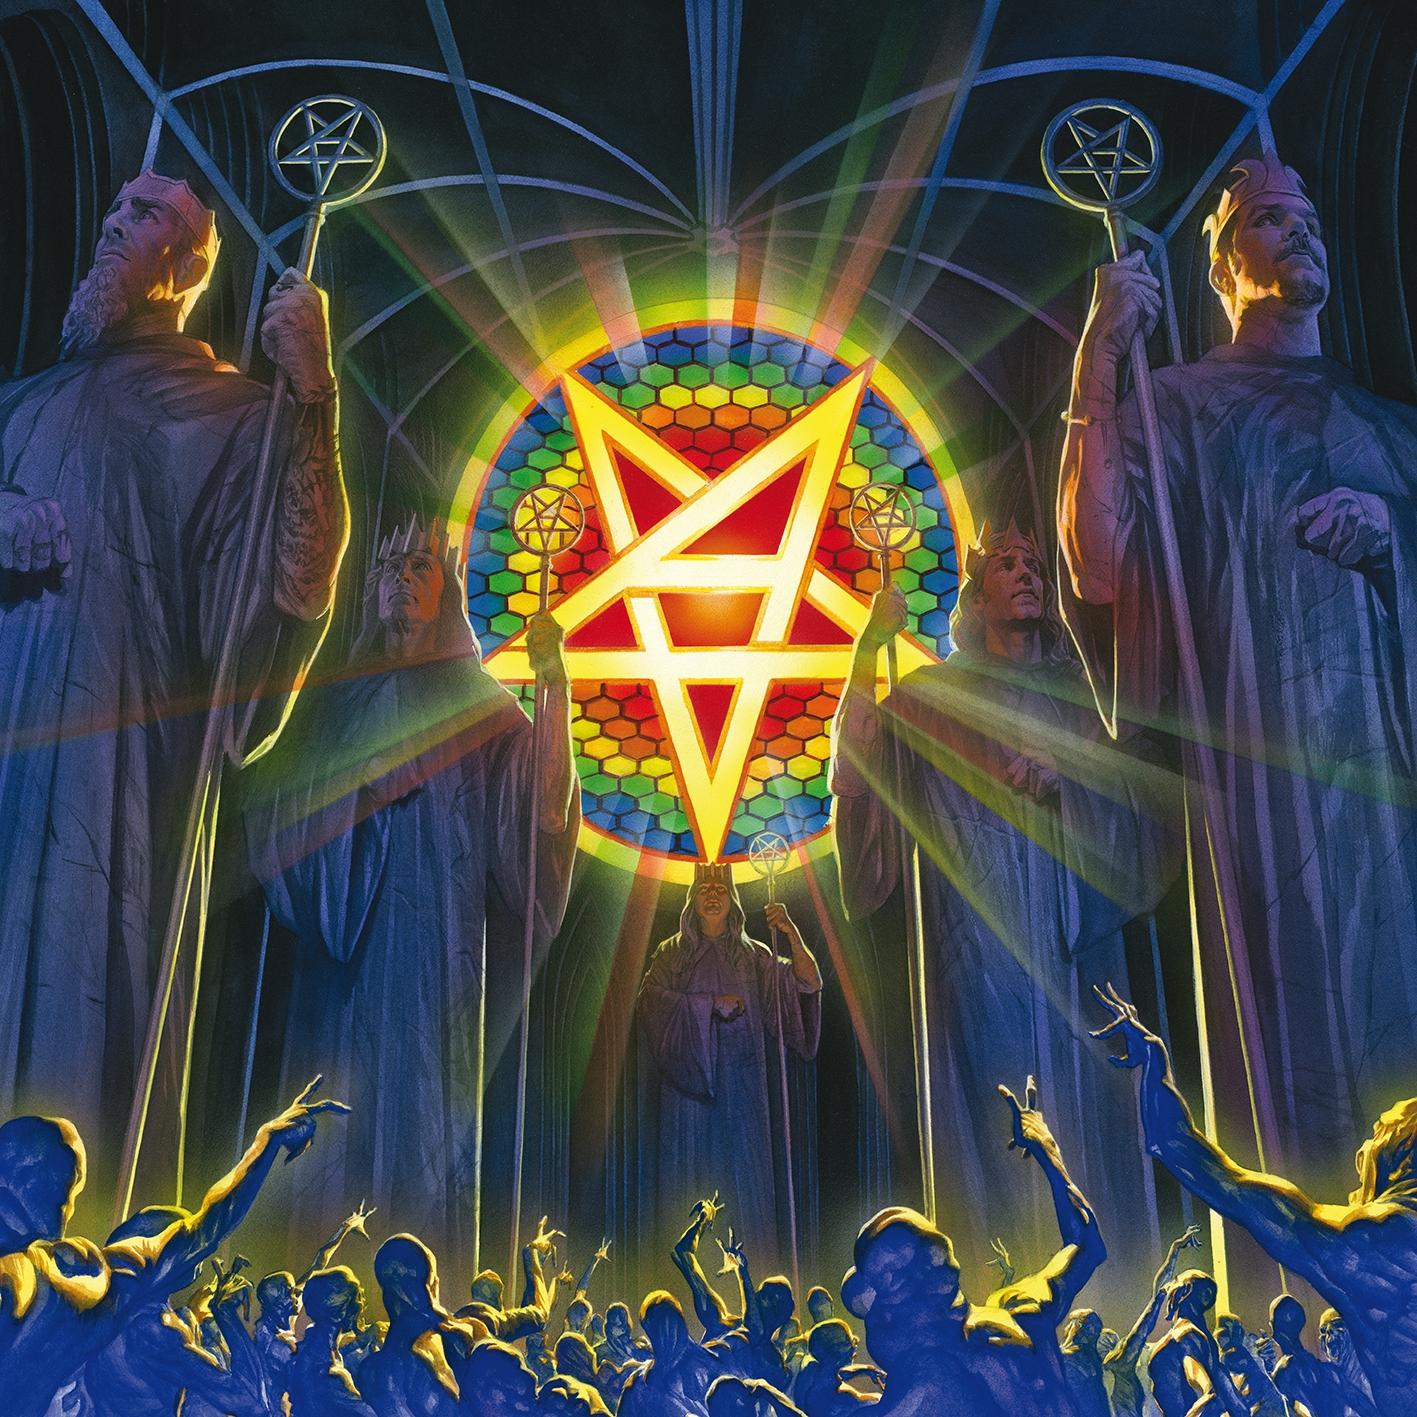 Anthrax - For All Kings - Artwork